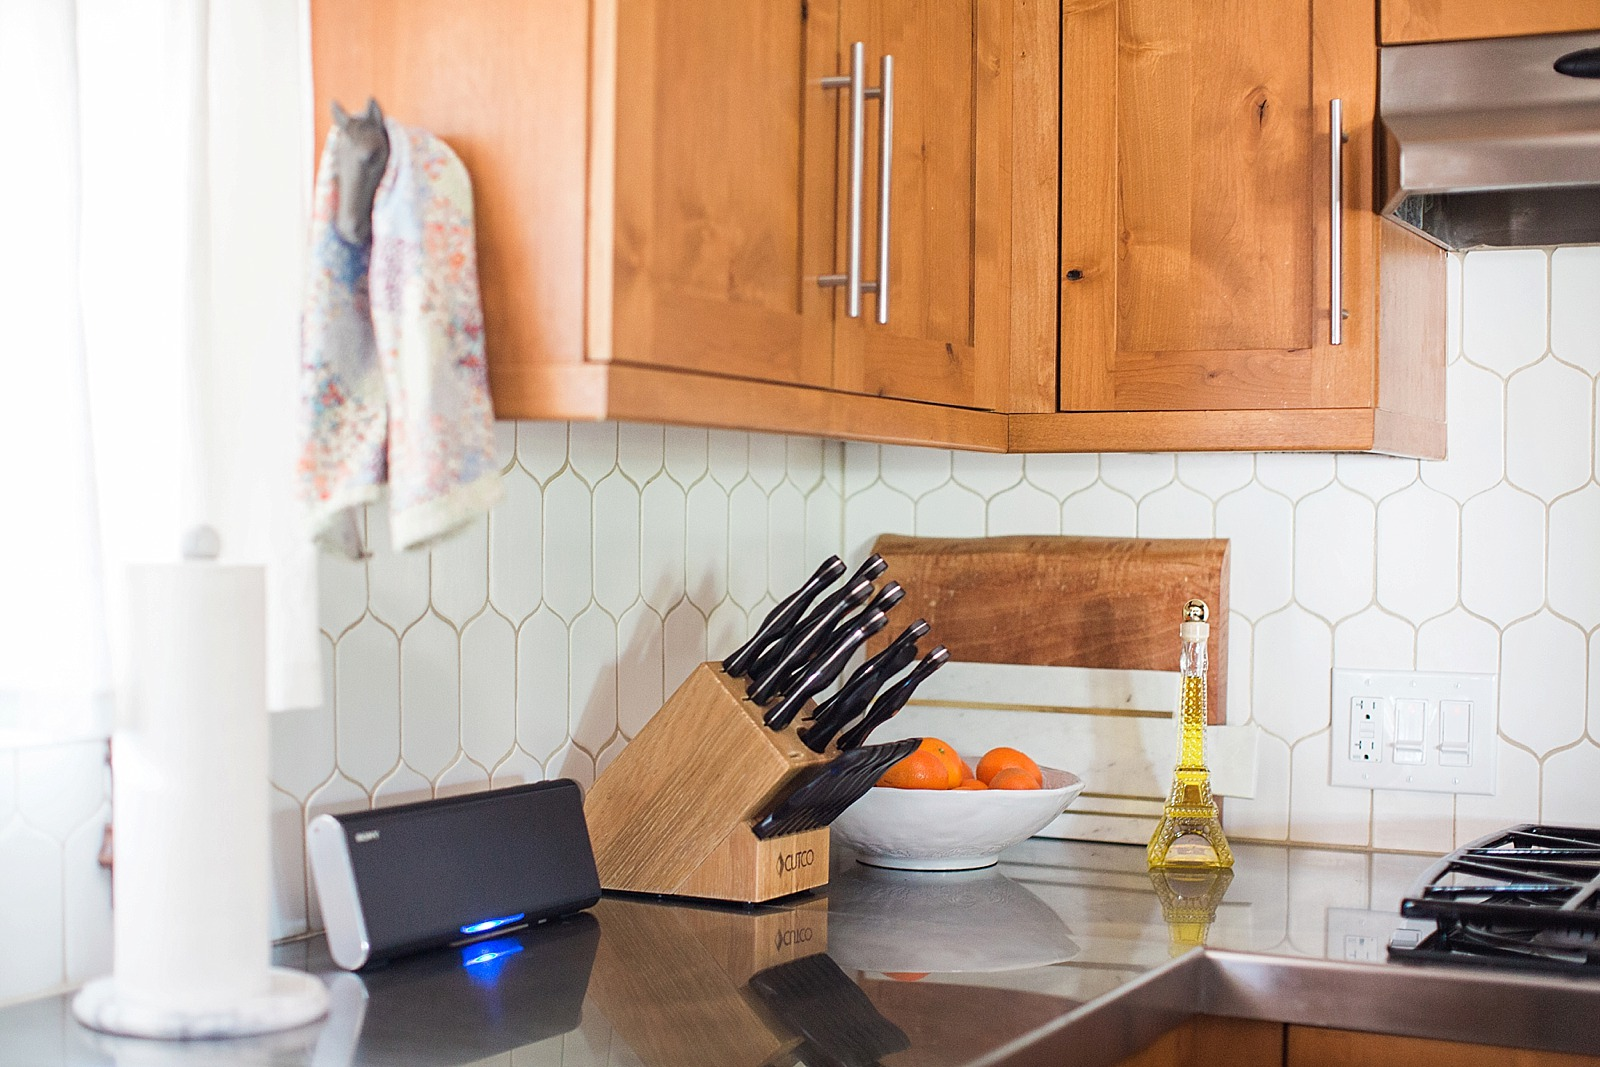 White kitchen backsplash remodel diana elizabeth backsplash kitchen white tile vertical 6th avenue cocoon mosaic walker zanger alternate of white subway dailygadgetfo Gallery